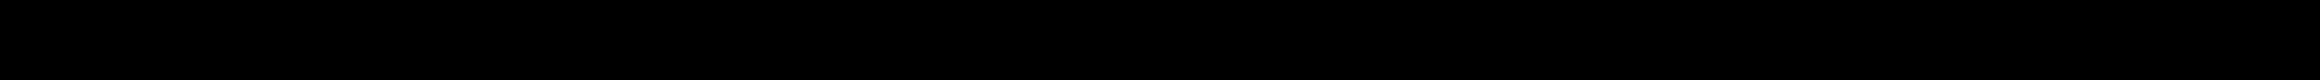 MAPCO 16806-00QA9, 1680600QAT, 16806-00QAU, 7701472644, 7701472675 Distributieriemset